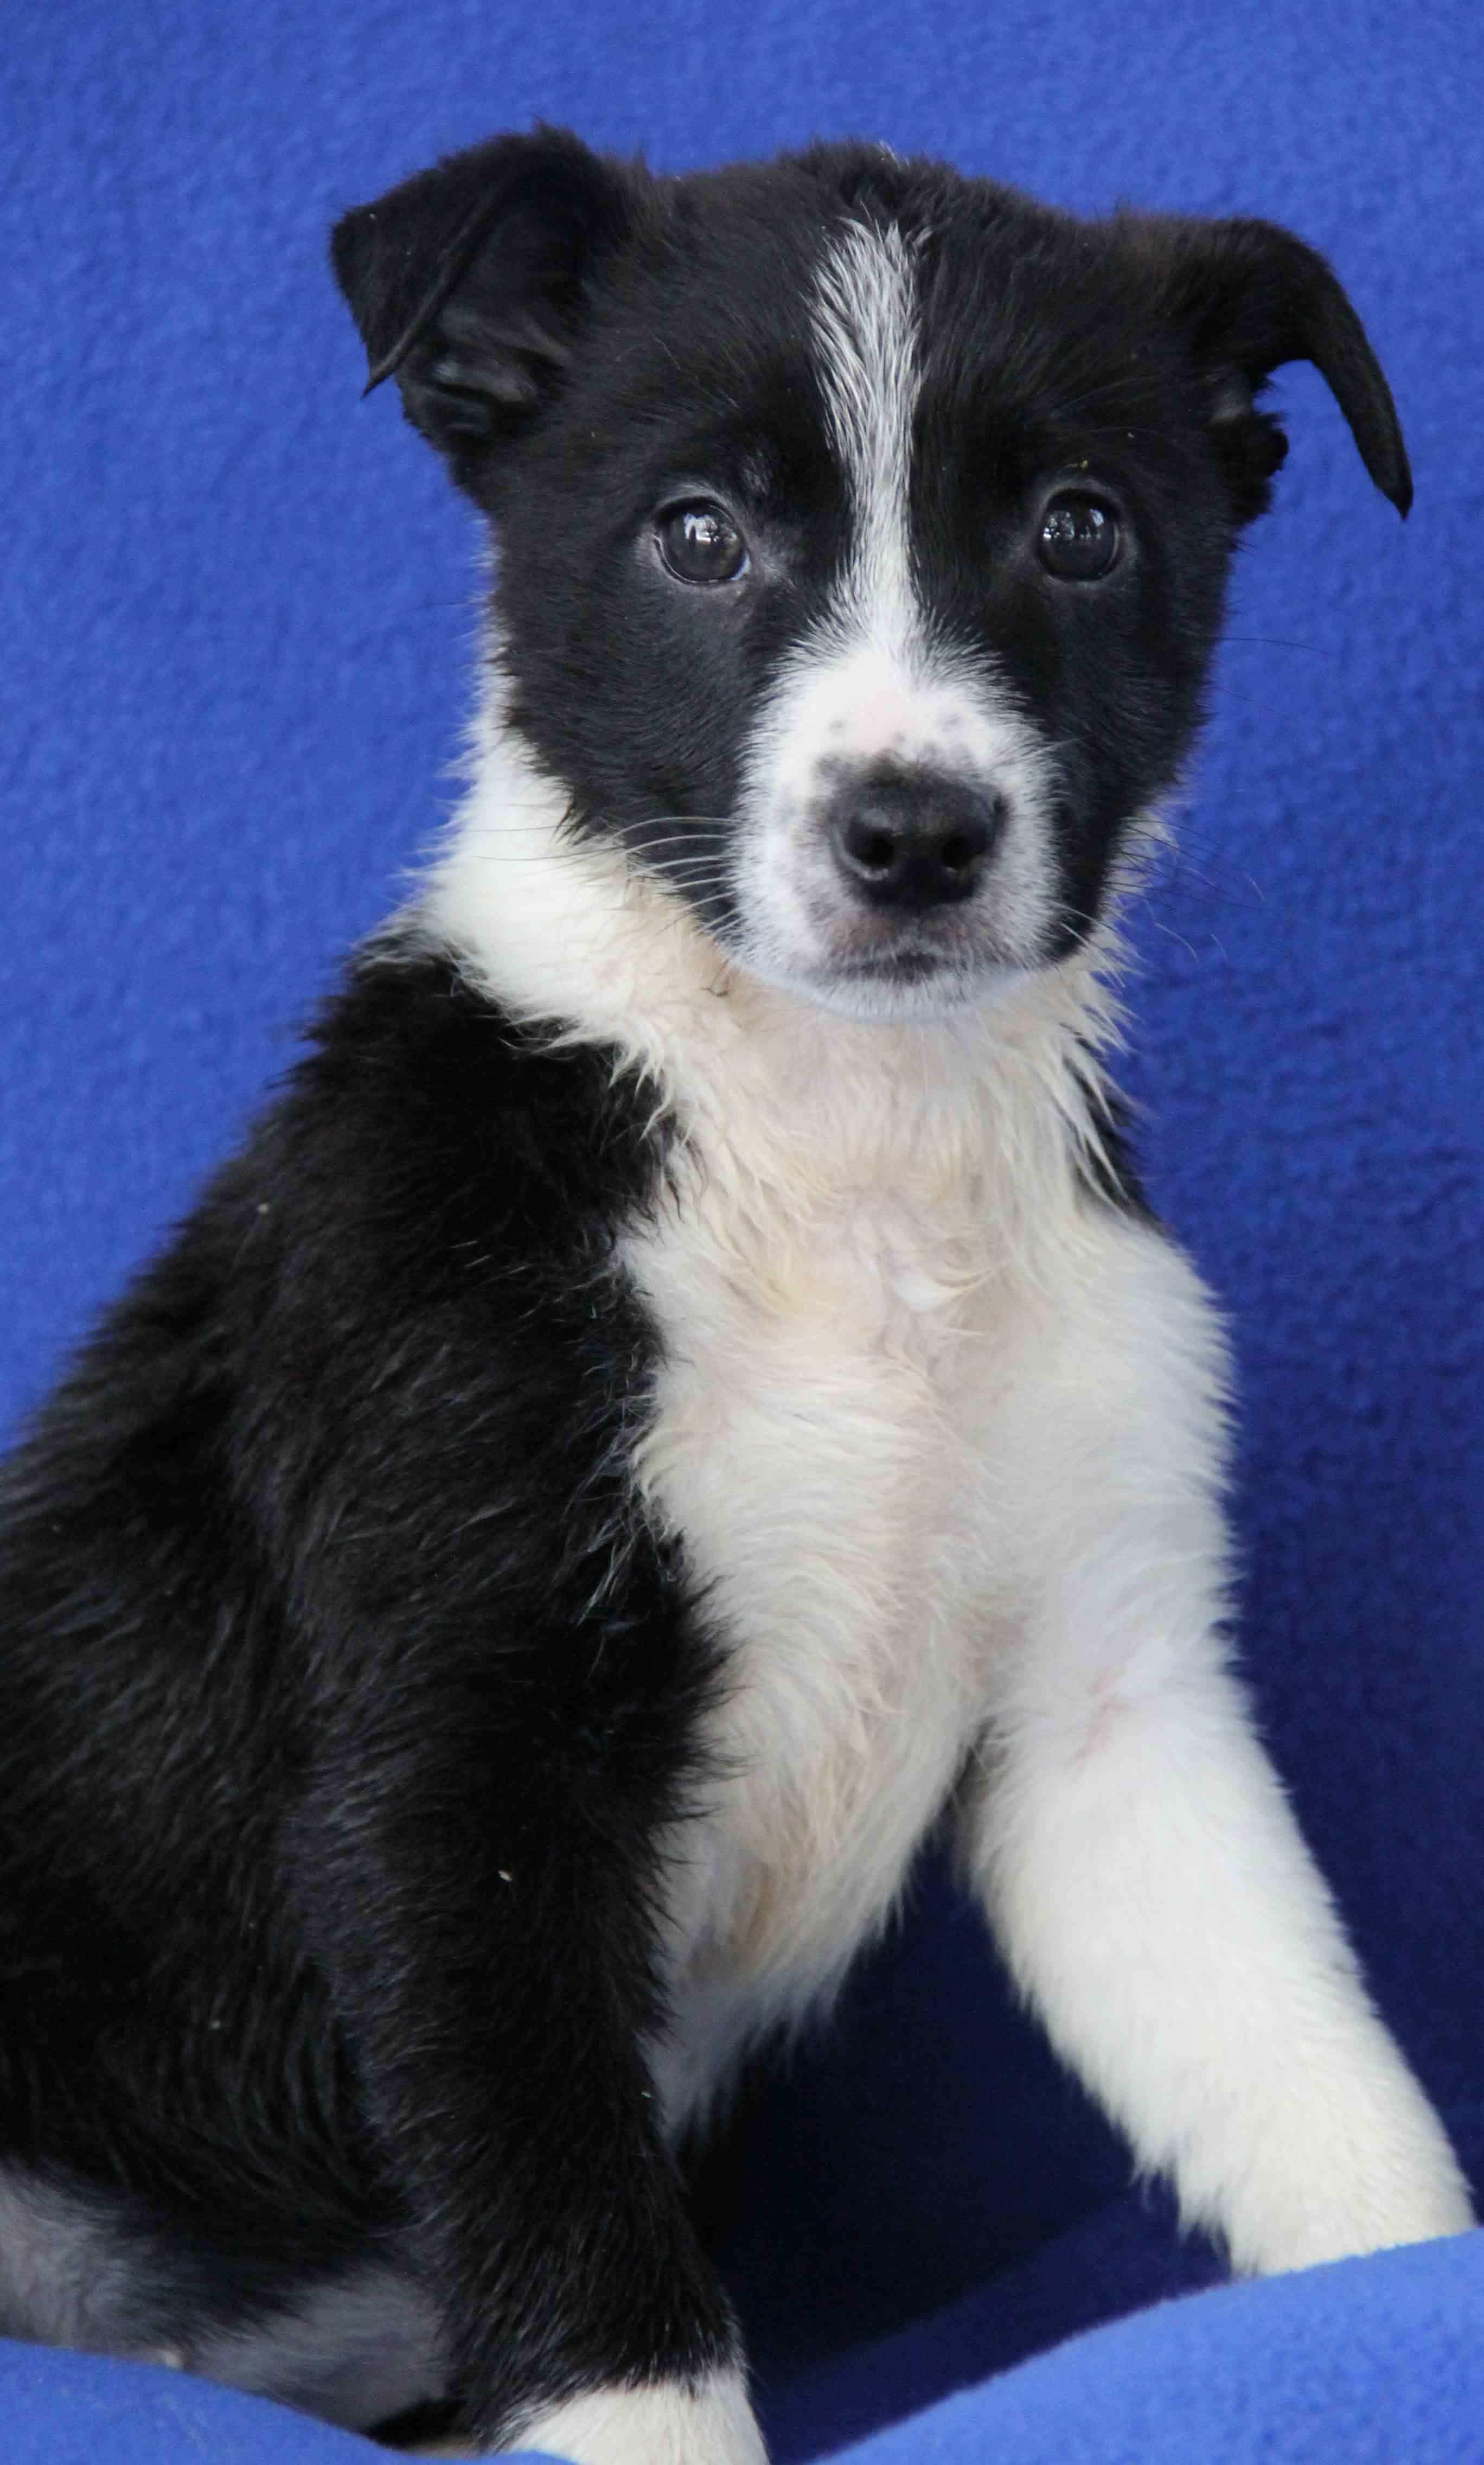 2018 01 05 Astoria Is An Adoptable Dog Border Collie